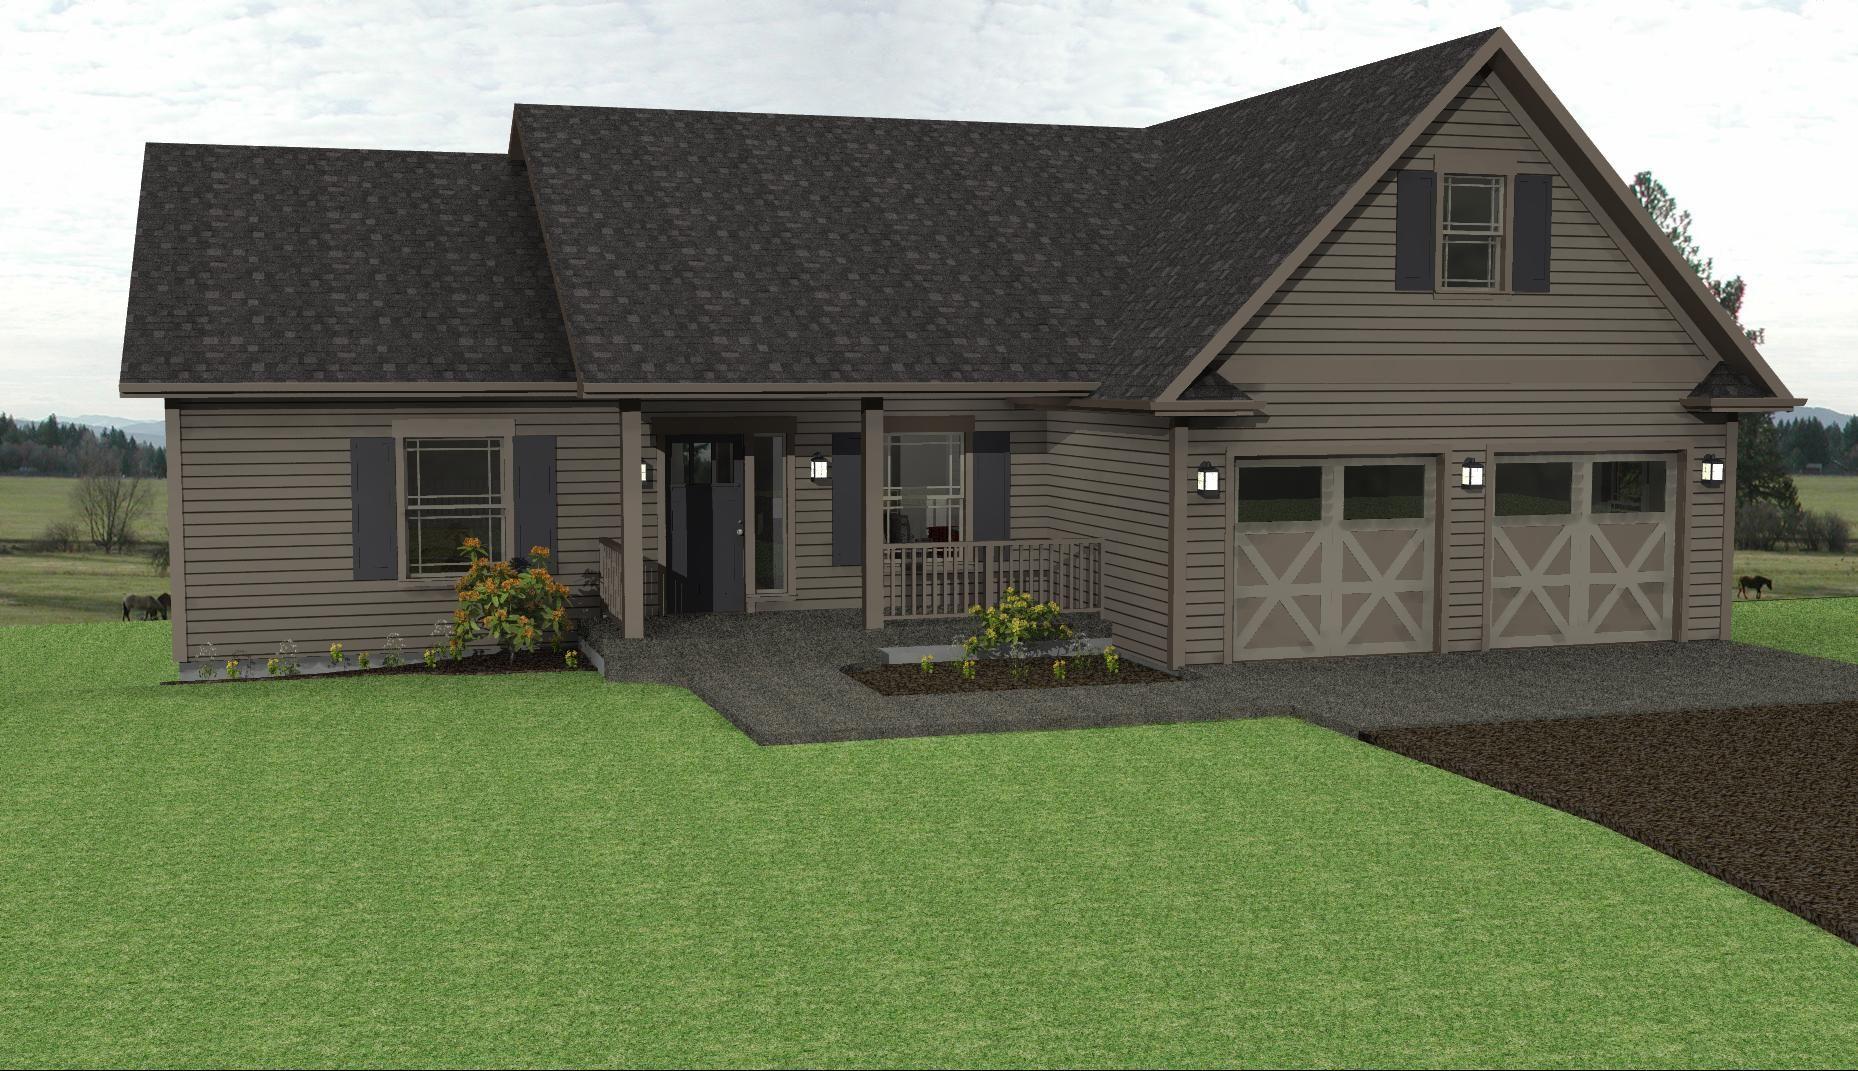 Marvelous 61 Best Ideas About House Plans On Pinterest Square Feet Ranch Largest Home Design Picture Inspirations Pitcheantrous